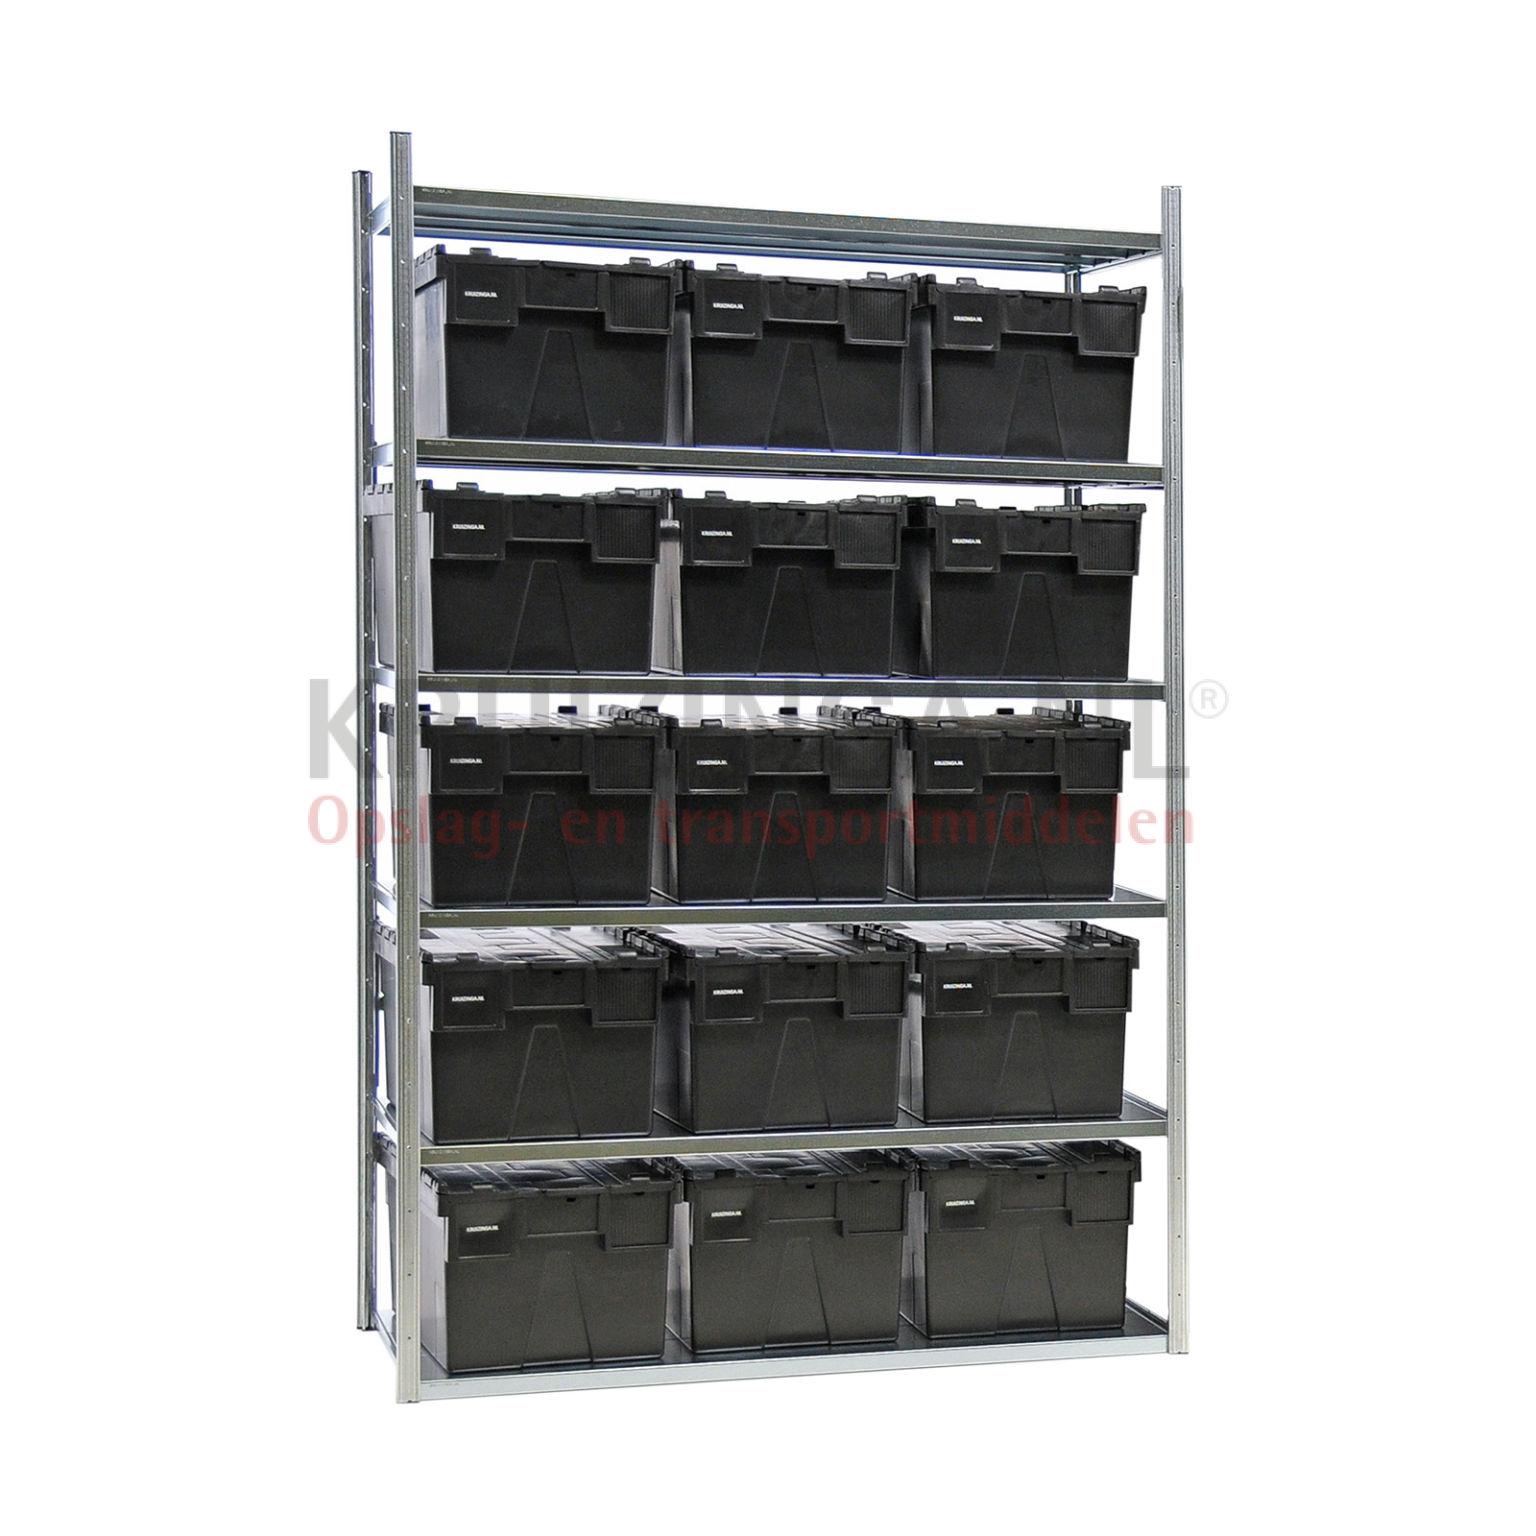 kombination satz regale kombination satz fachbodenregal inkl 15 stapelboxen mit deckel ab 416. Black Bedroom Furniture Sets. Home Design Ideas